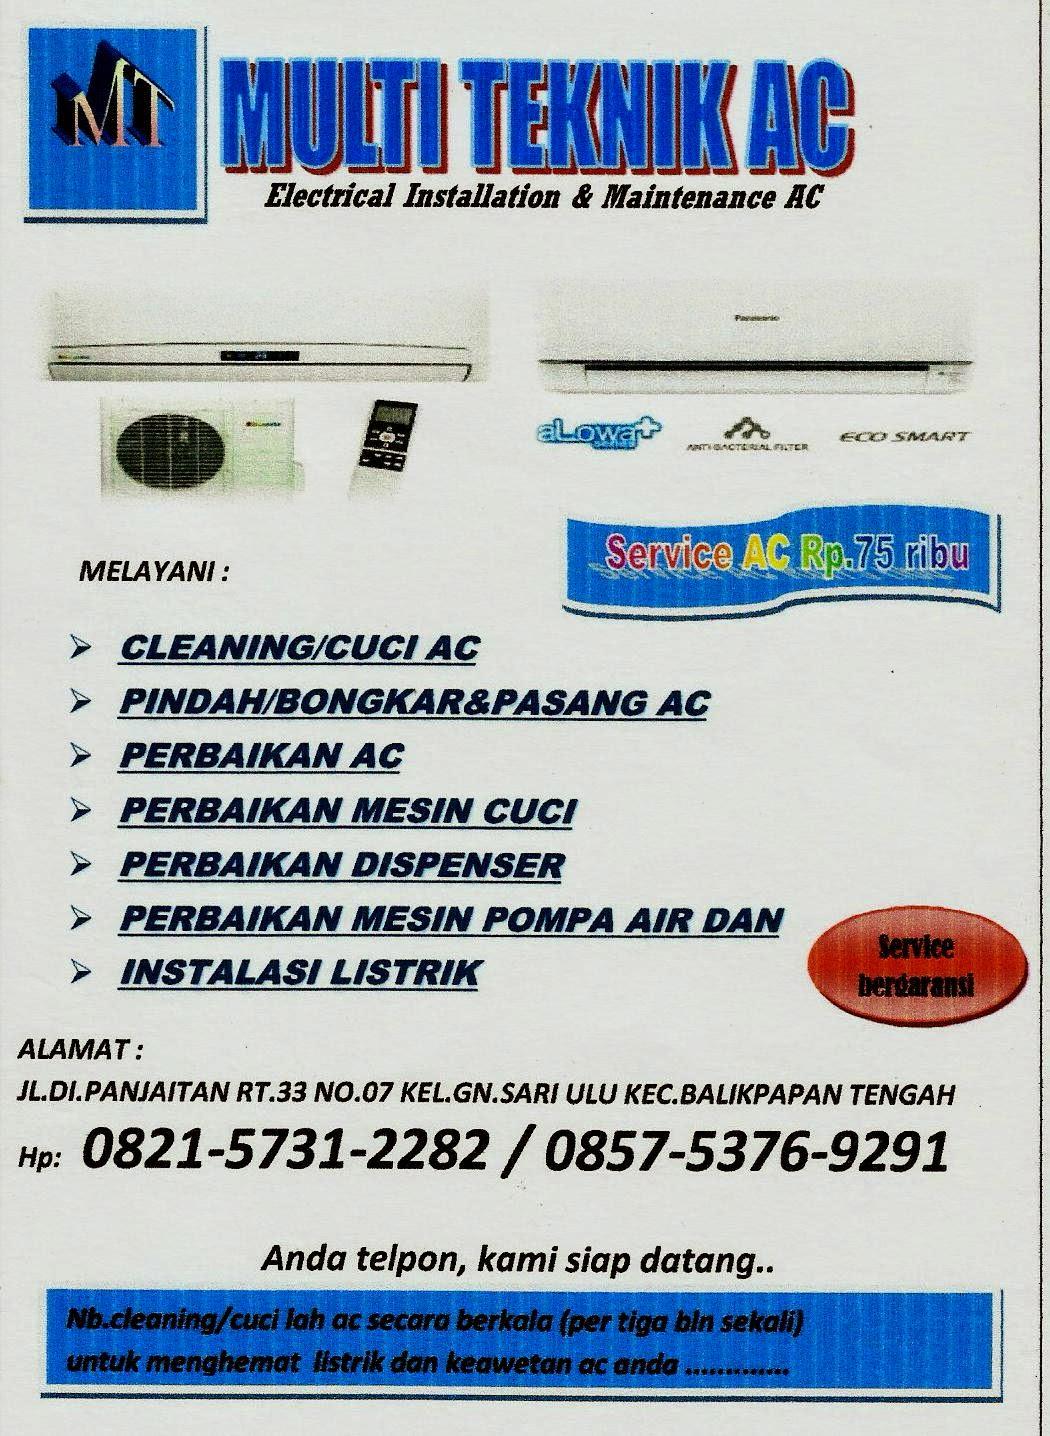 Contoh Brosur Jasa Service Ac Natal 6